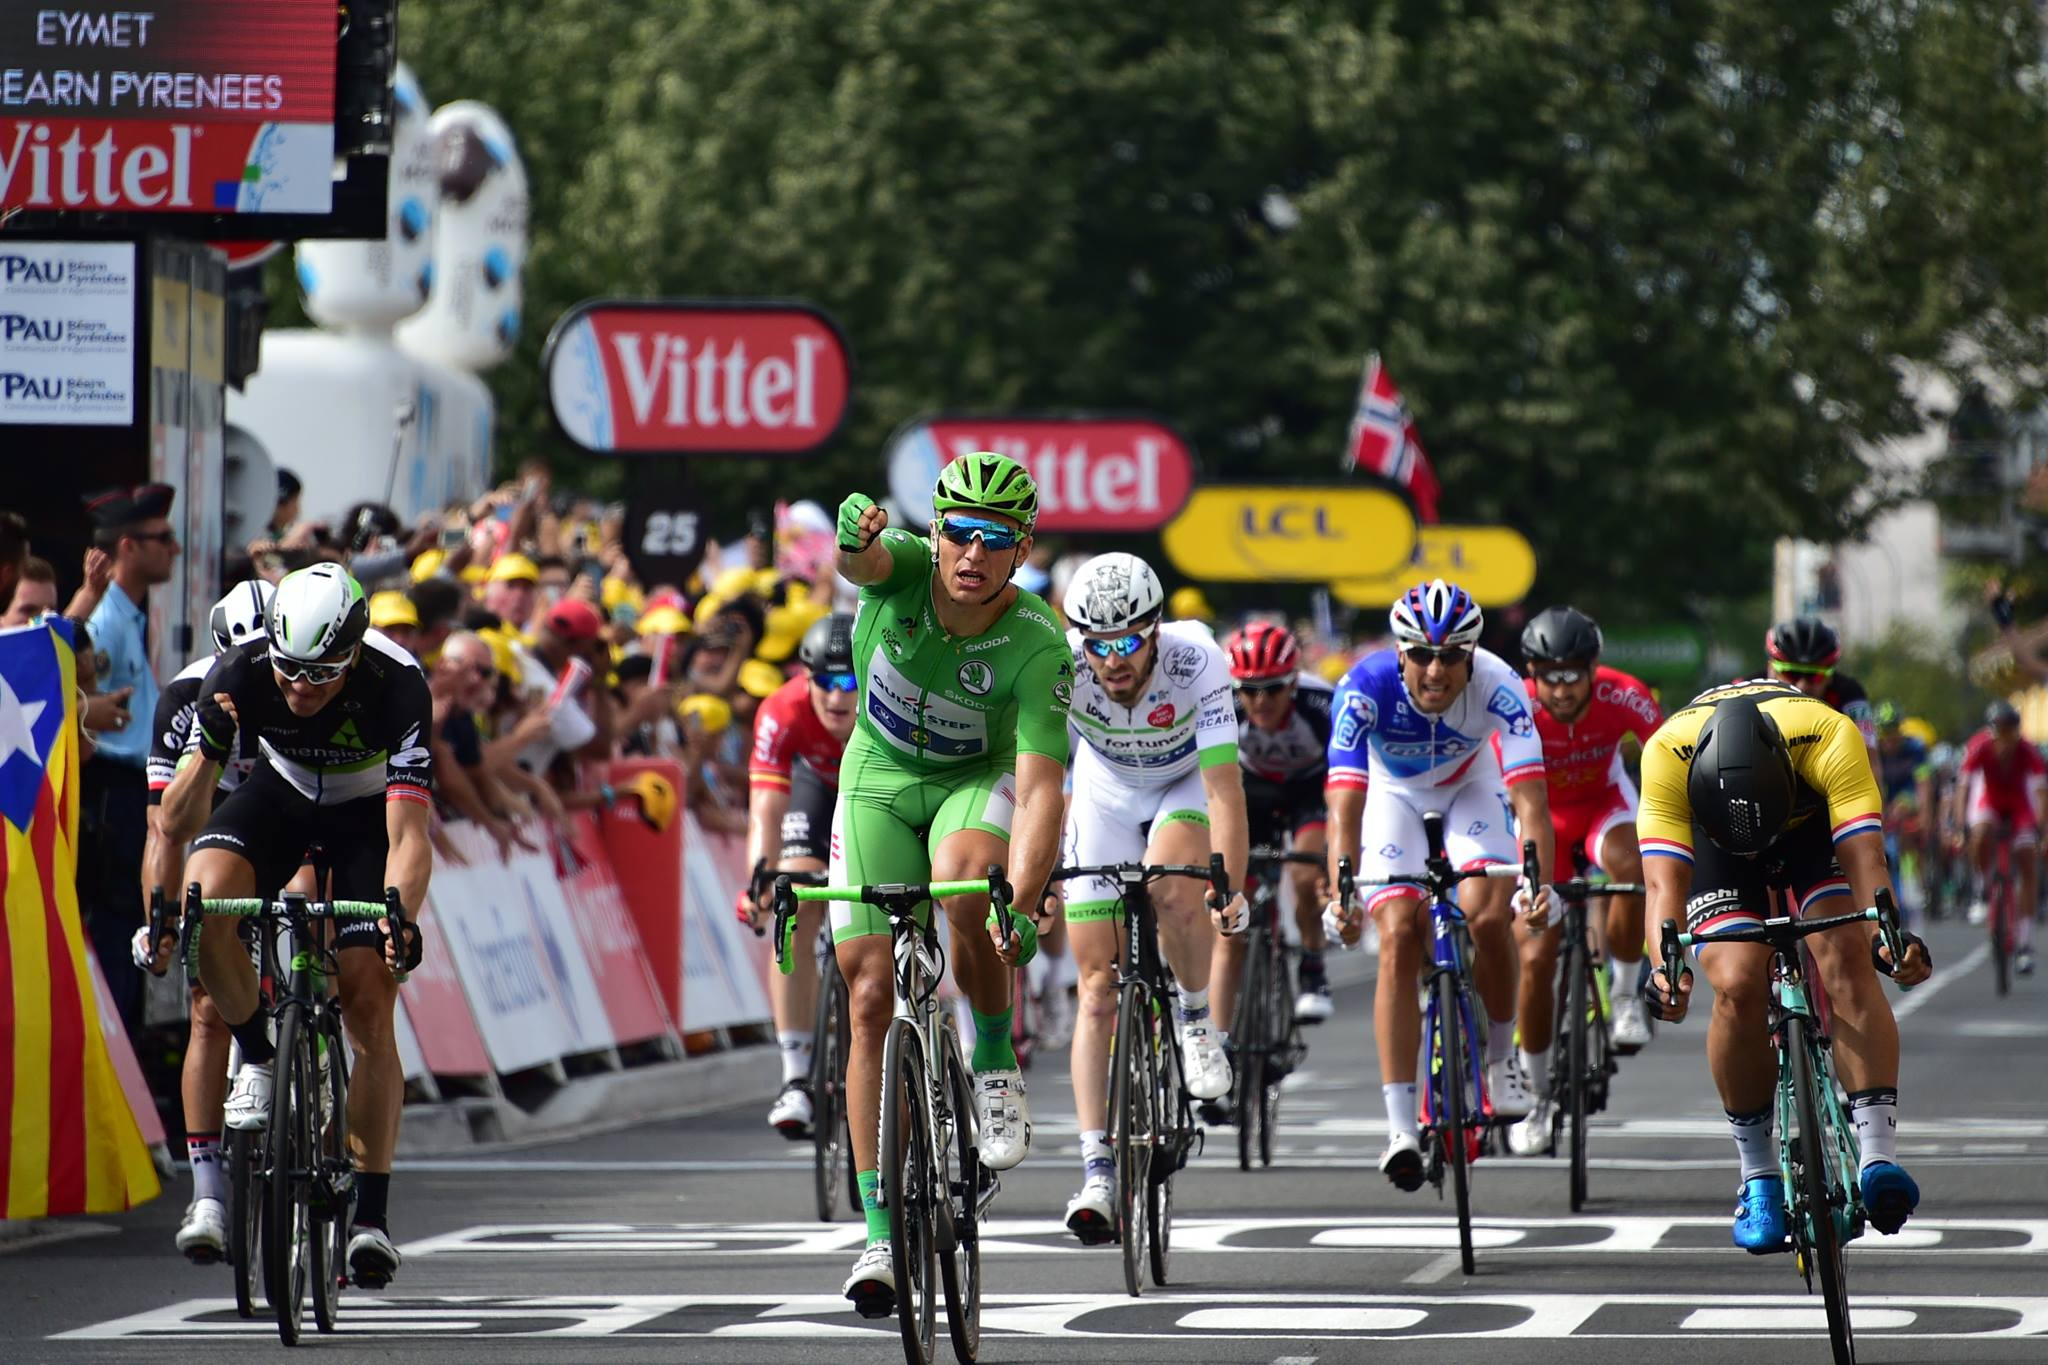 Marcel Kittel castiga etapa 11 din Turul Frantei